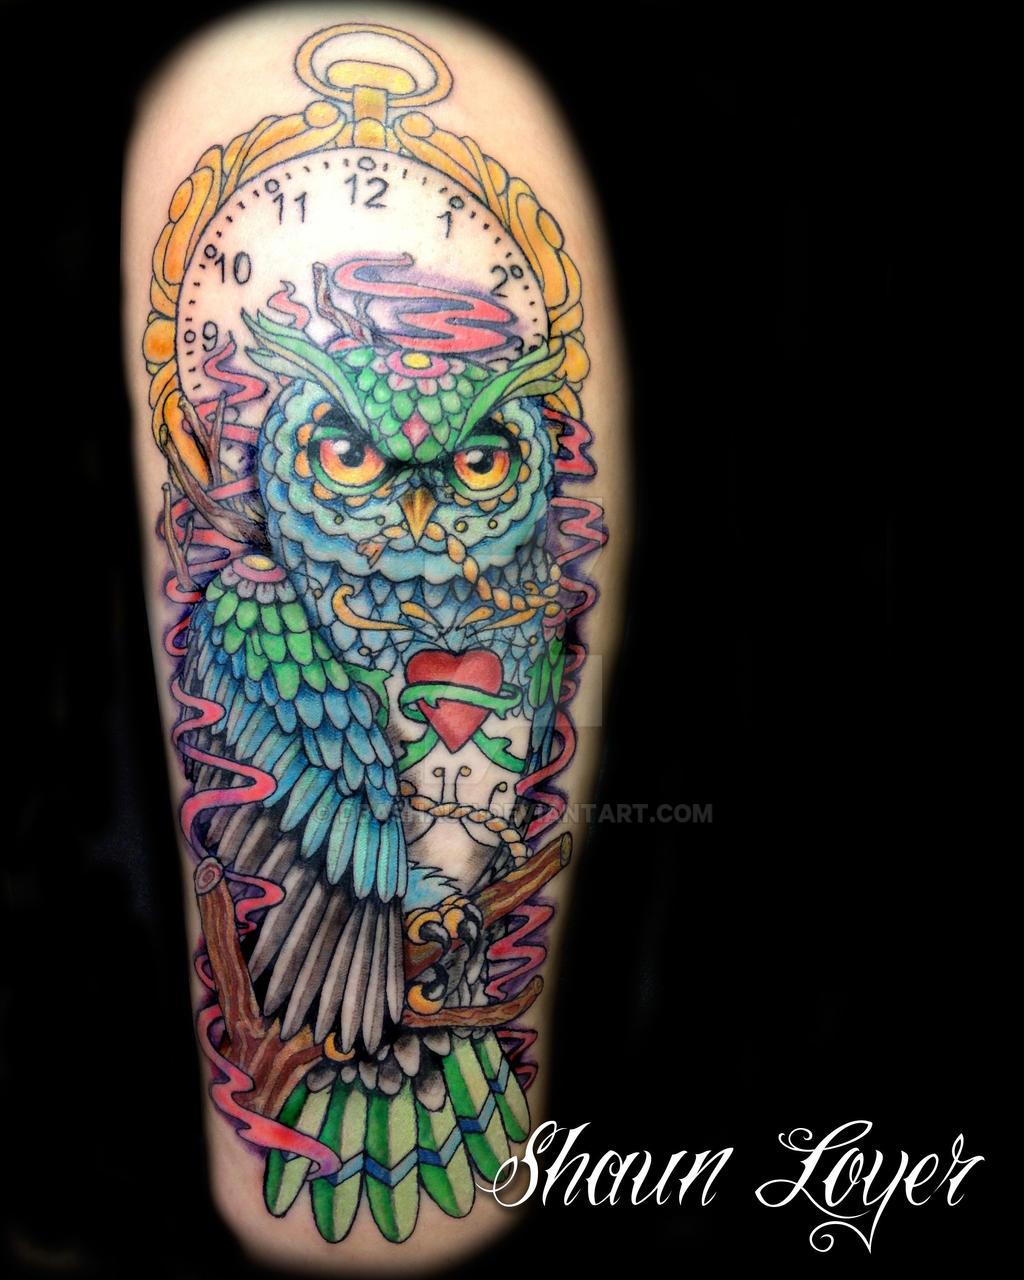 Owl Color Tattoo By DBASHAUN On DeviantArt